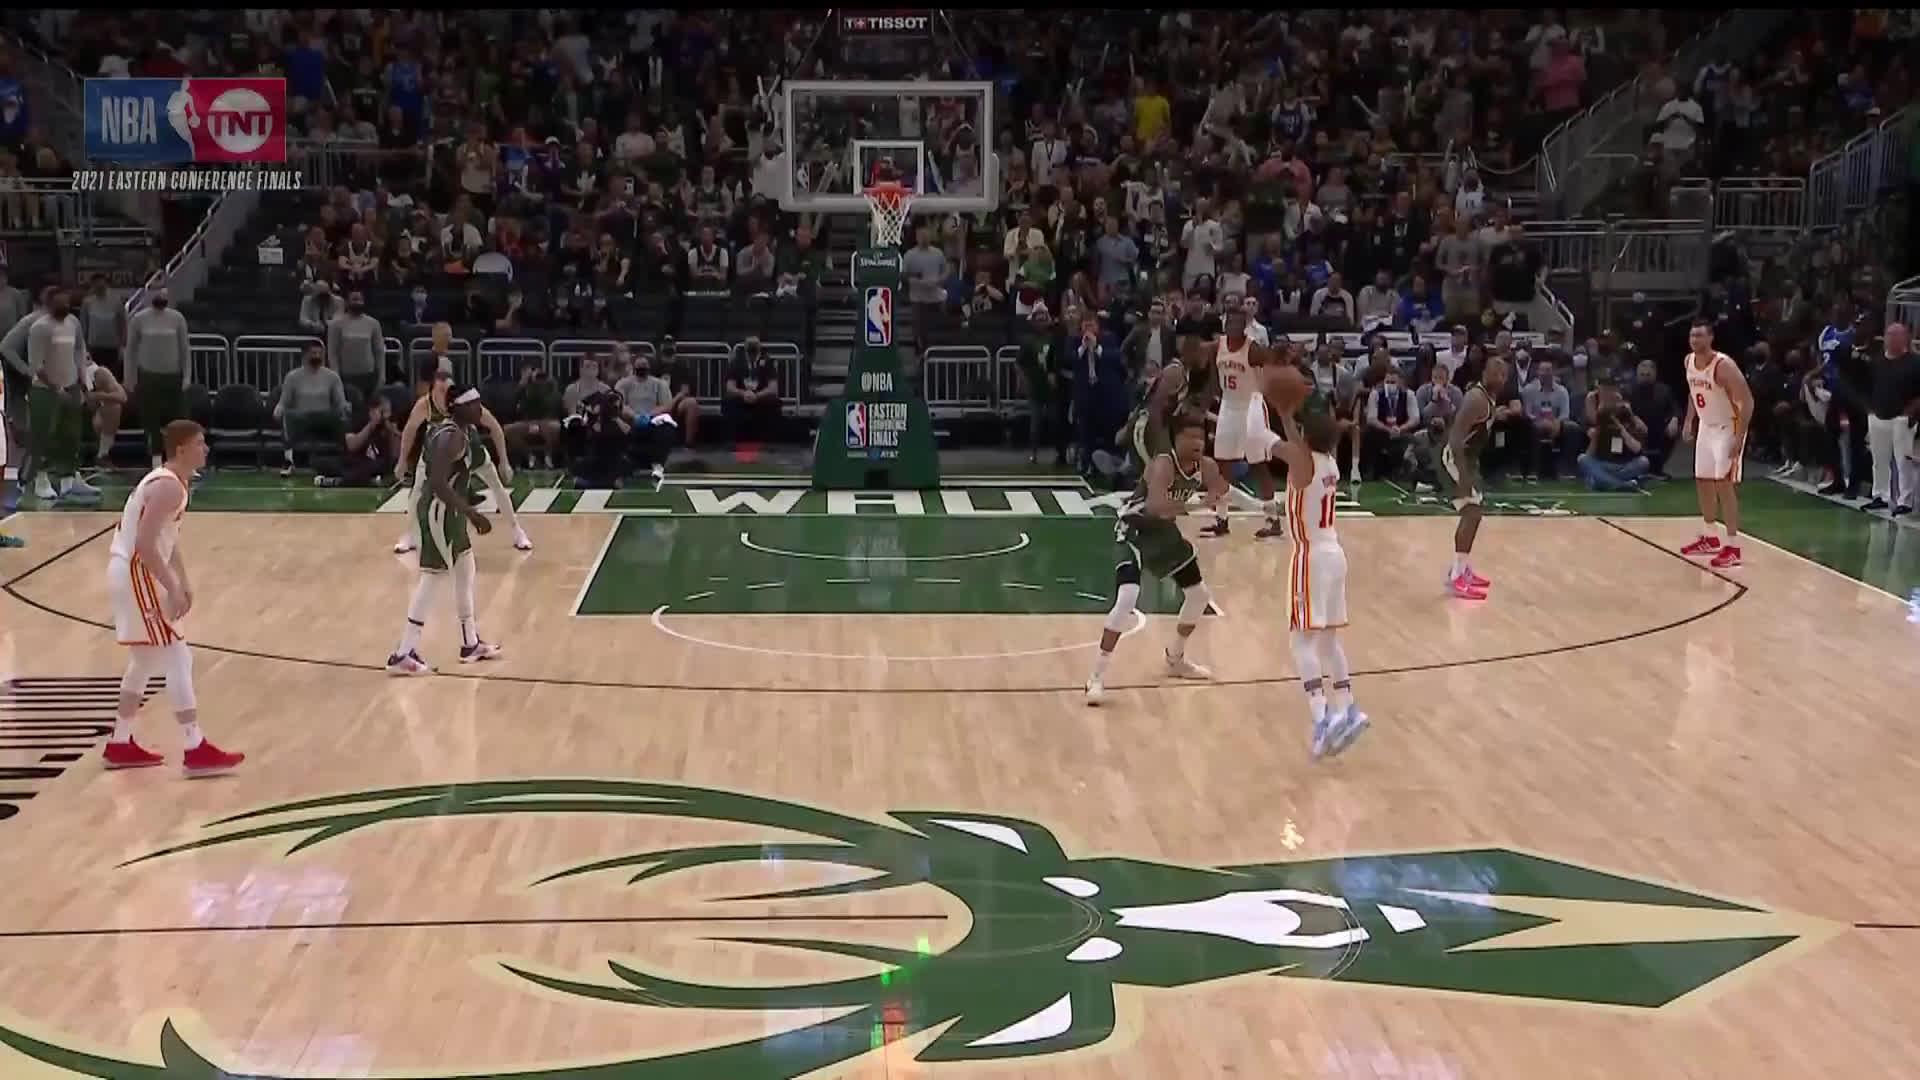 [Highlight] Giannis's landing/follow-through foul on Trae from last night